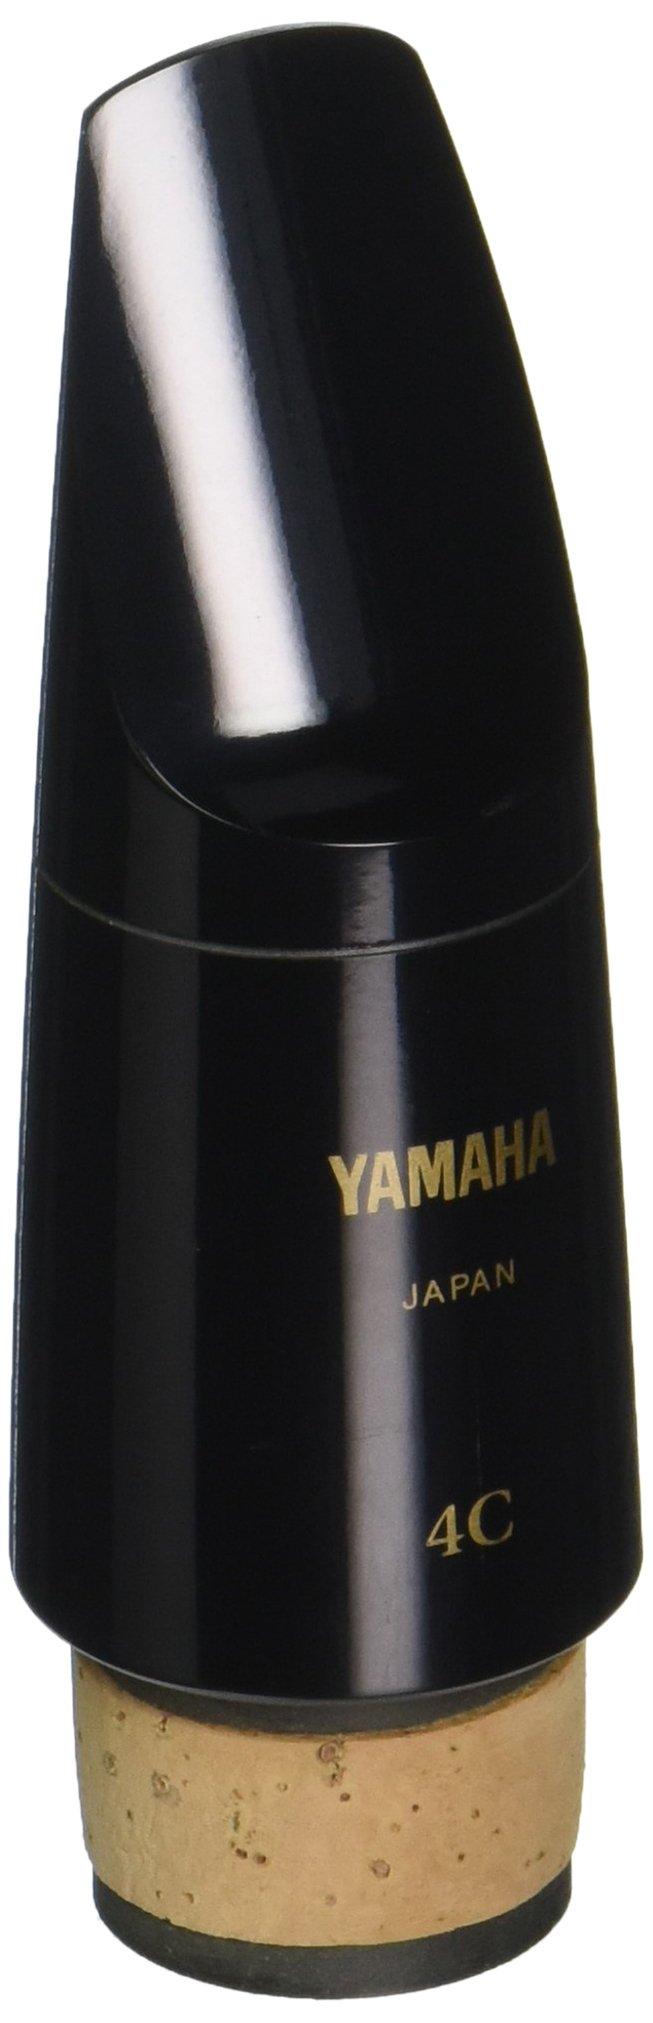 Yamaha YAC1270 4C Standard Alto Clarinet Mouthpiece